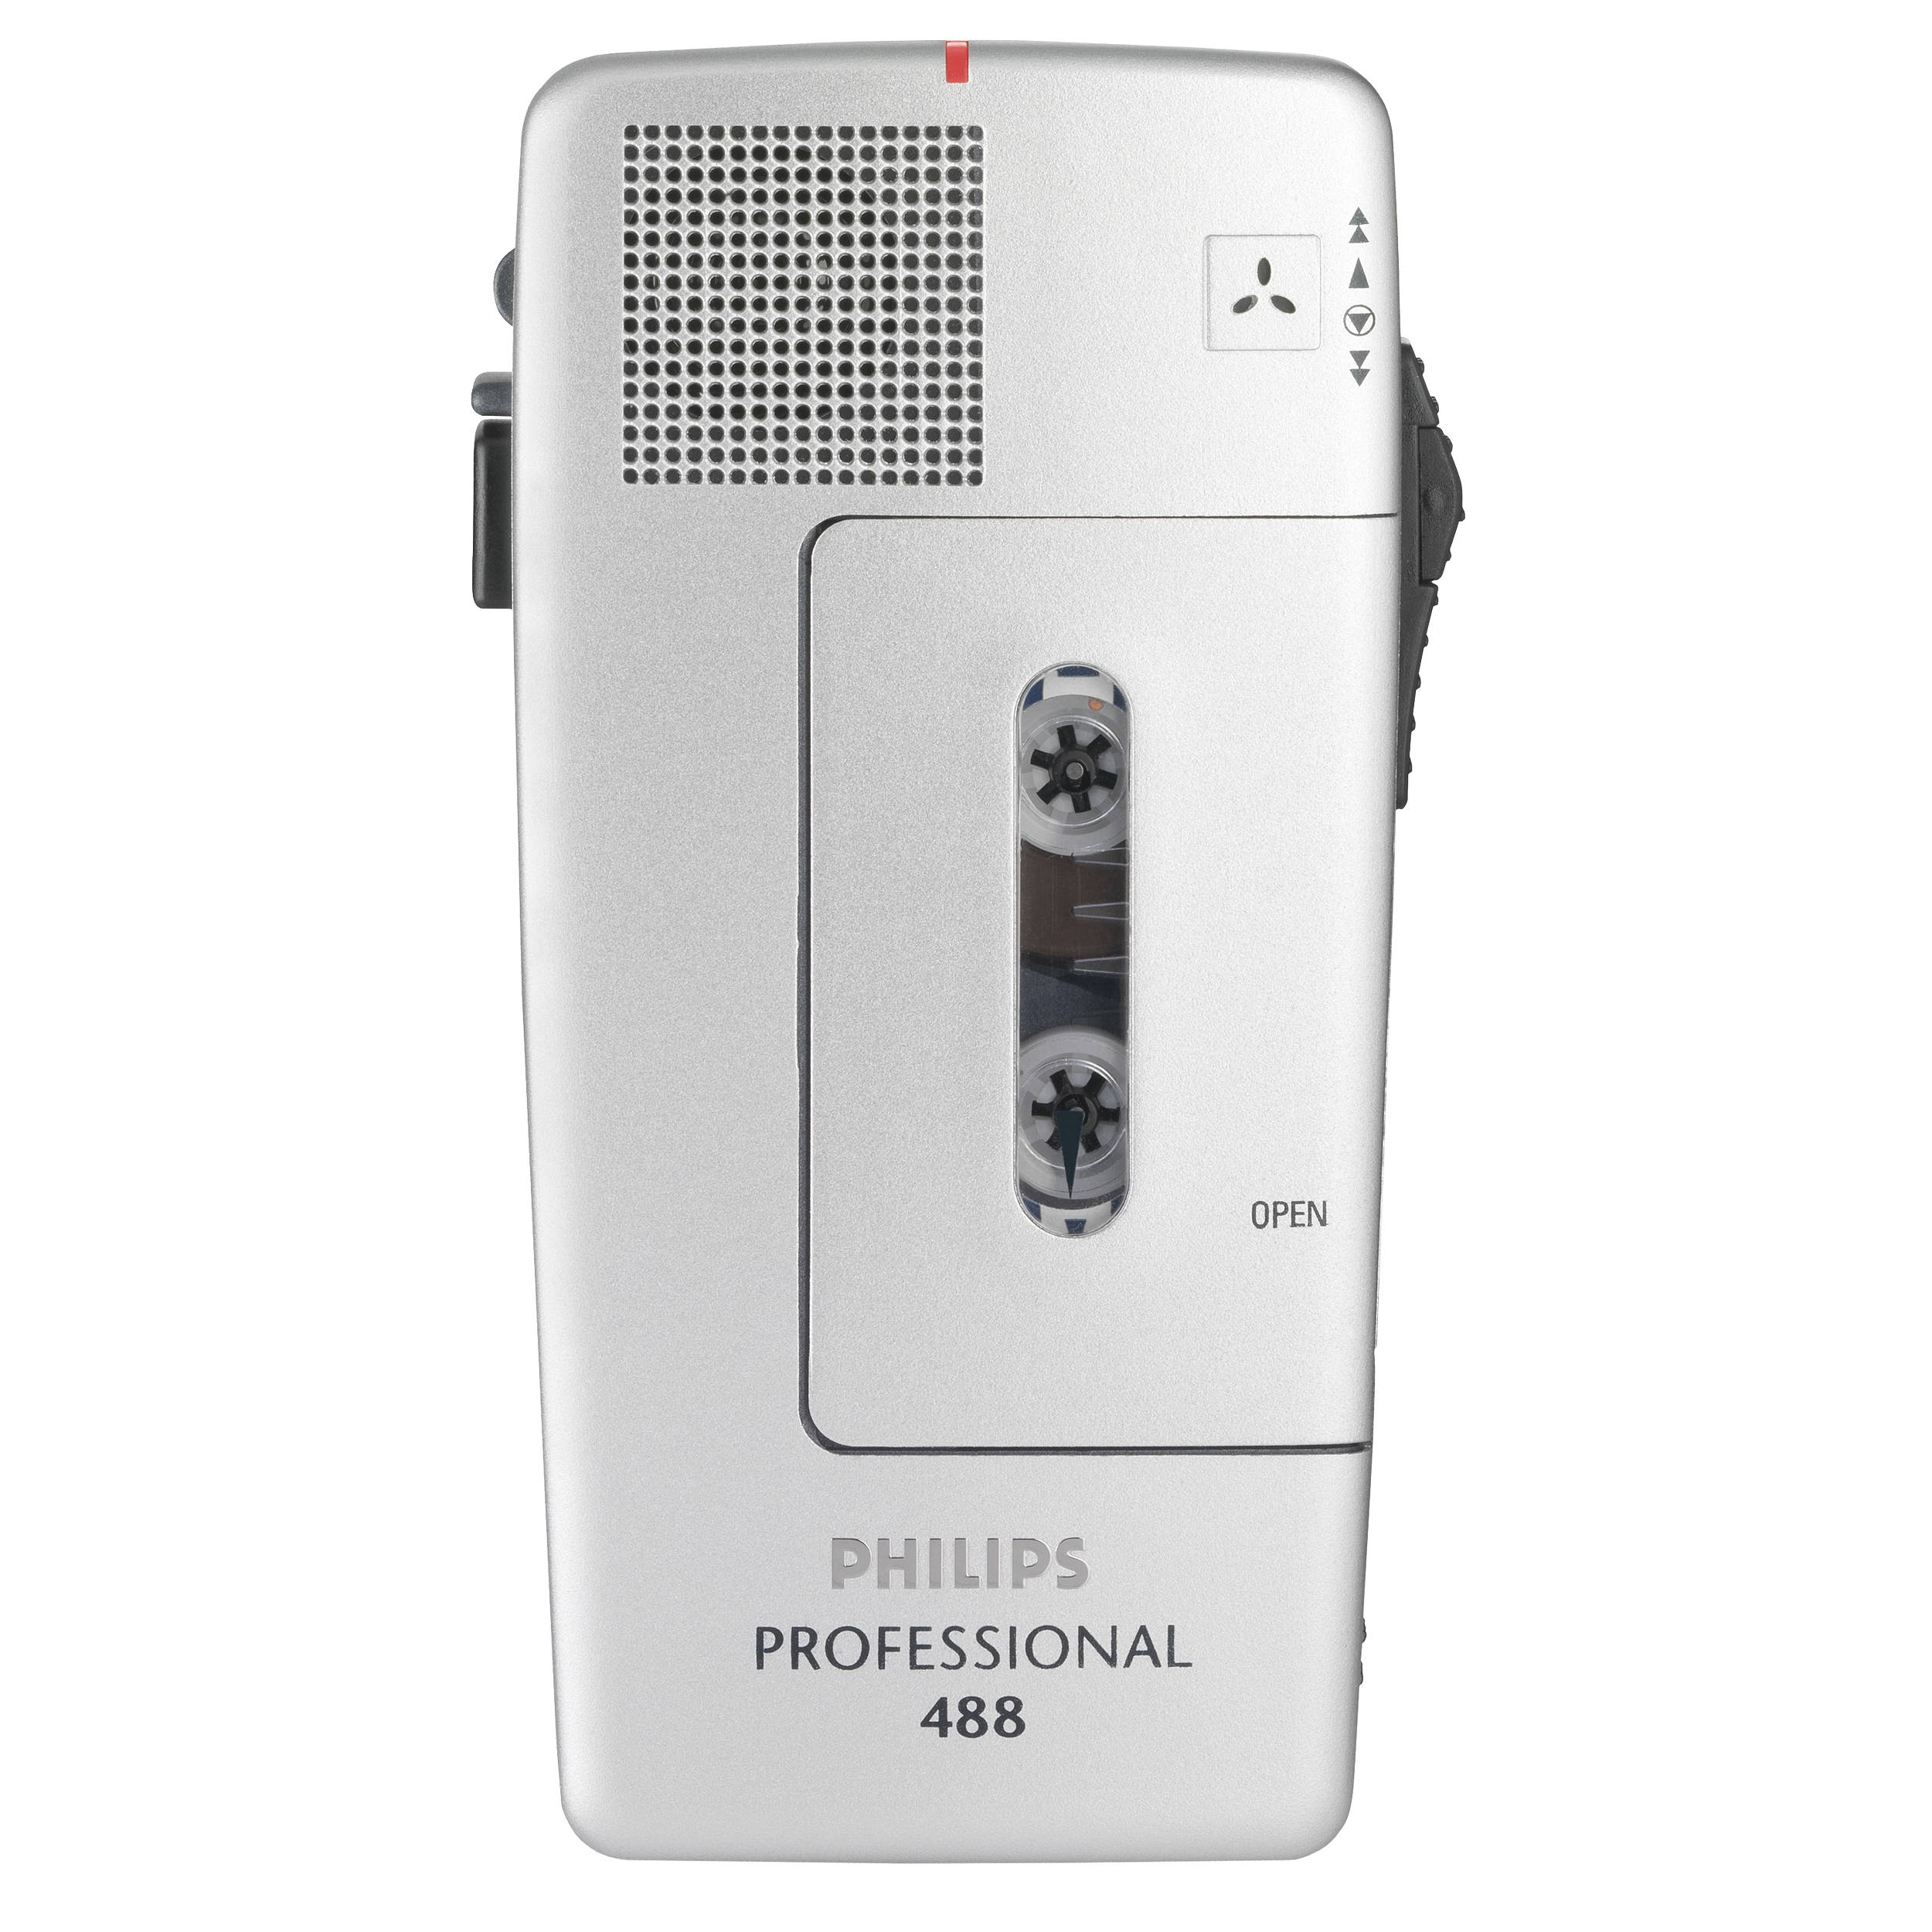 Philips Classic 488 Mini Cassette Recorder Lfh0488 00b Bh Photo Free Ongkir Dry Iron Hi 1172